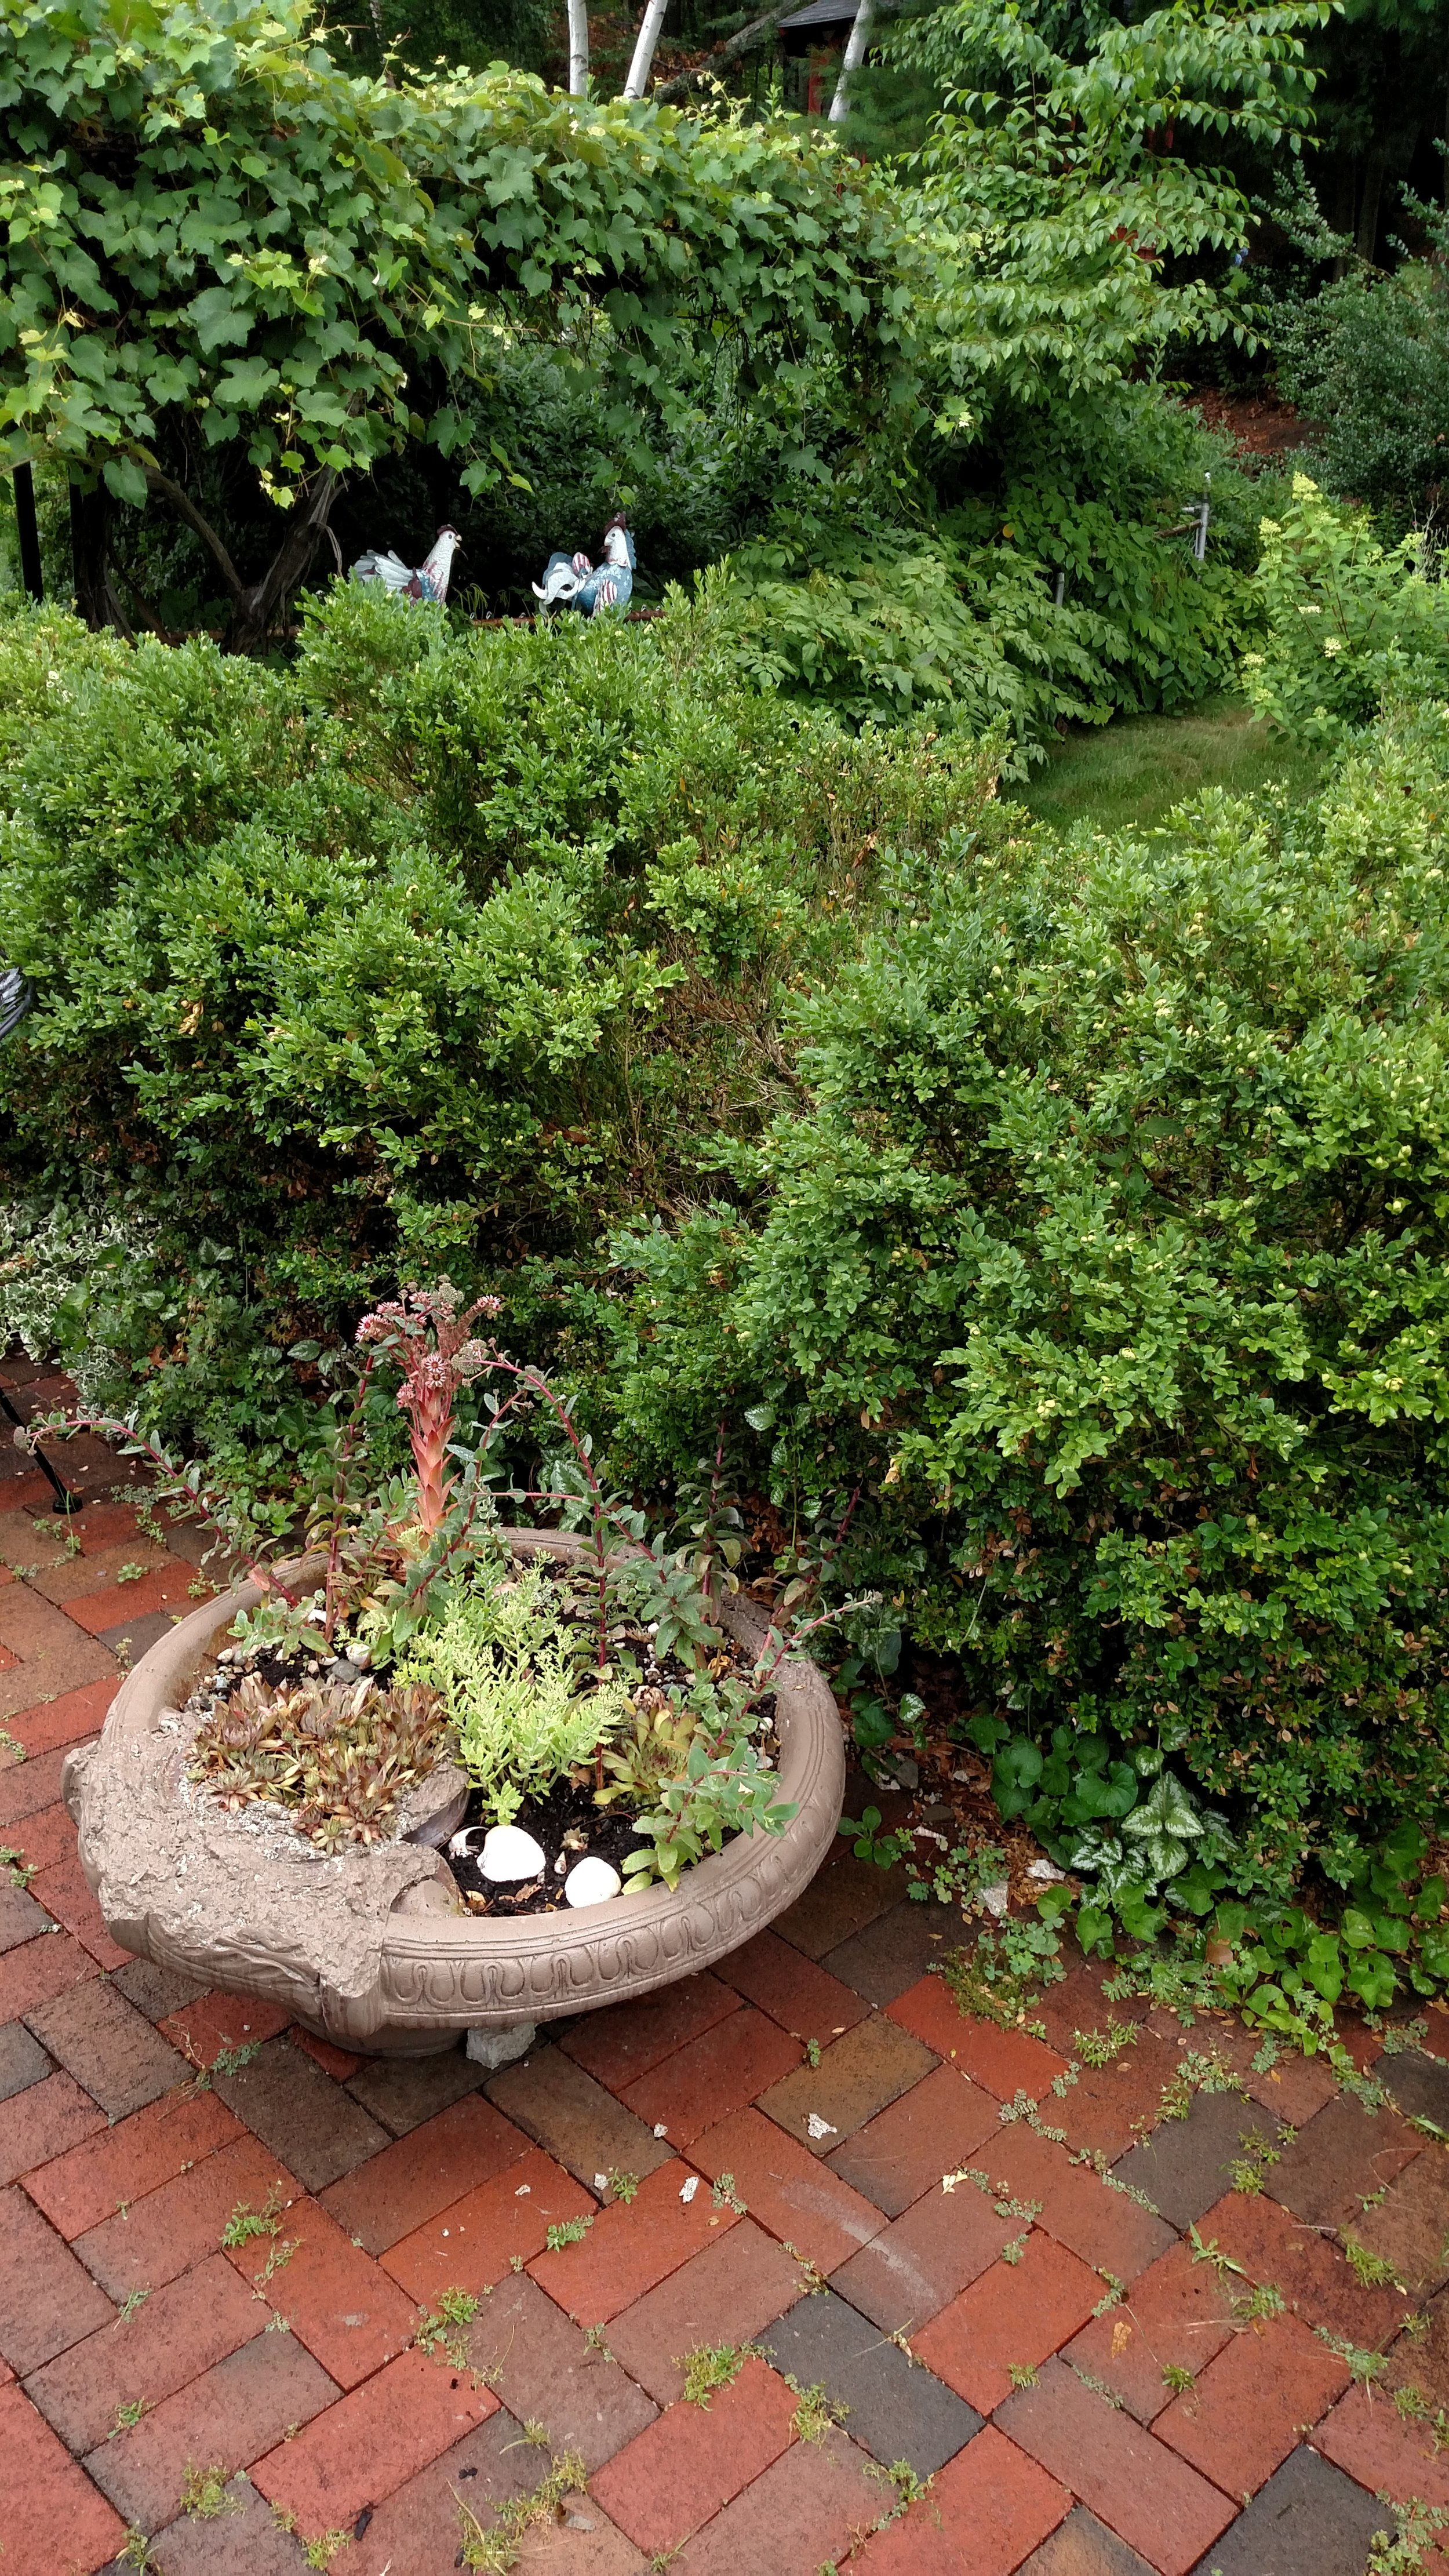 7-20-18 Shapiro Garden 14.jpg